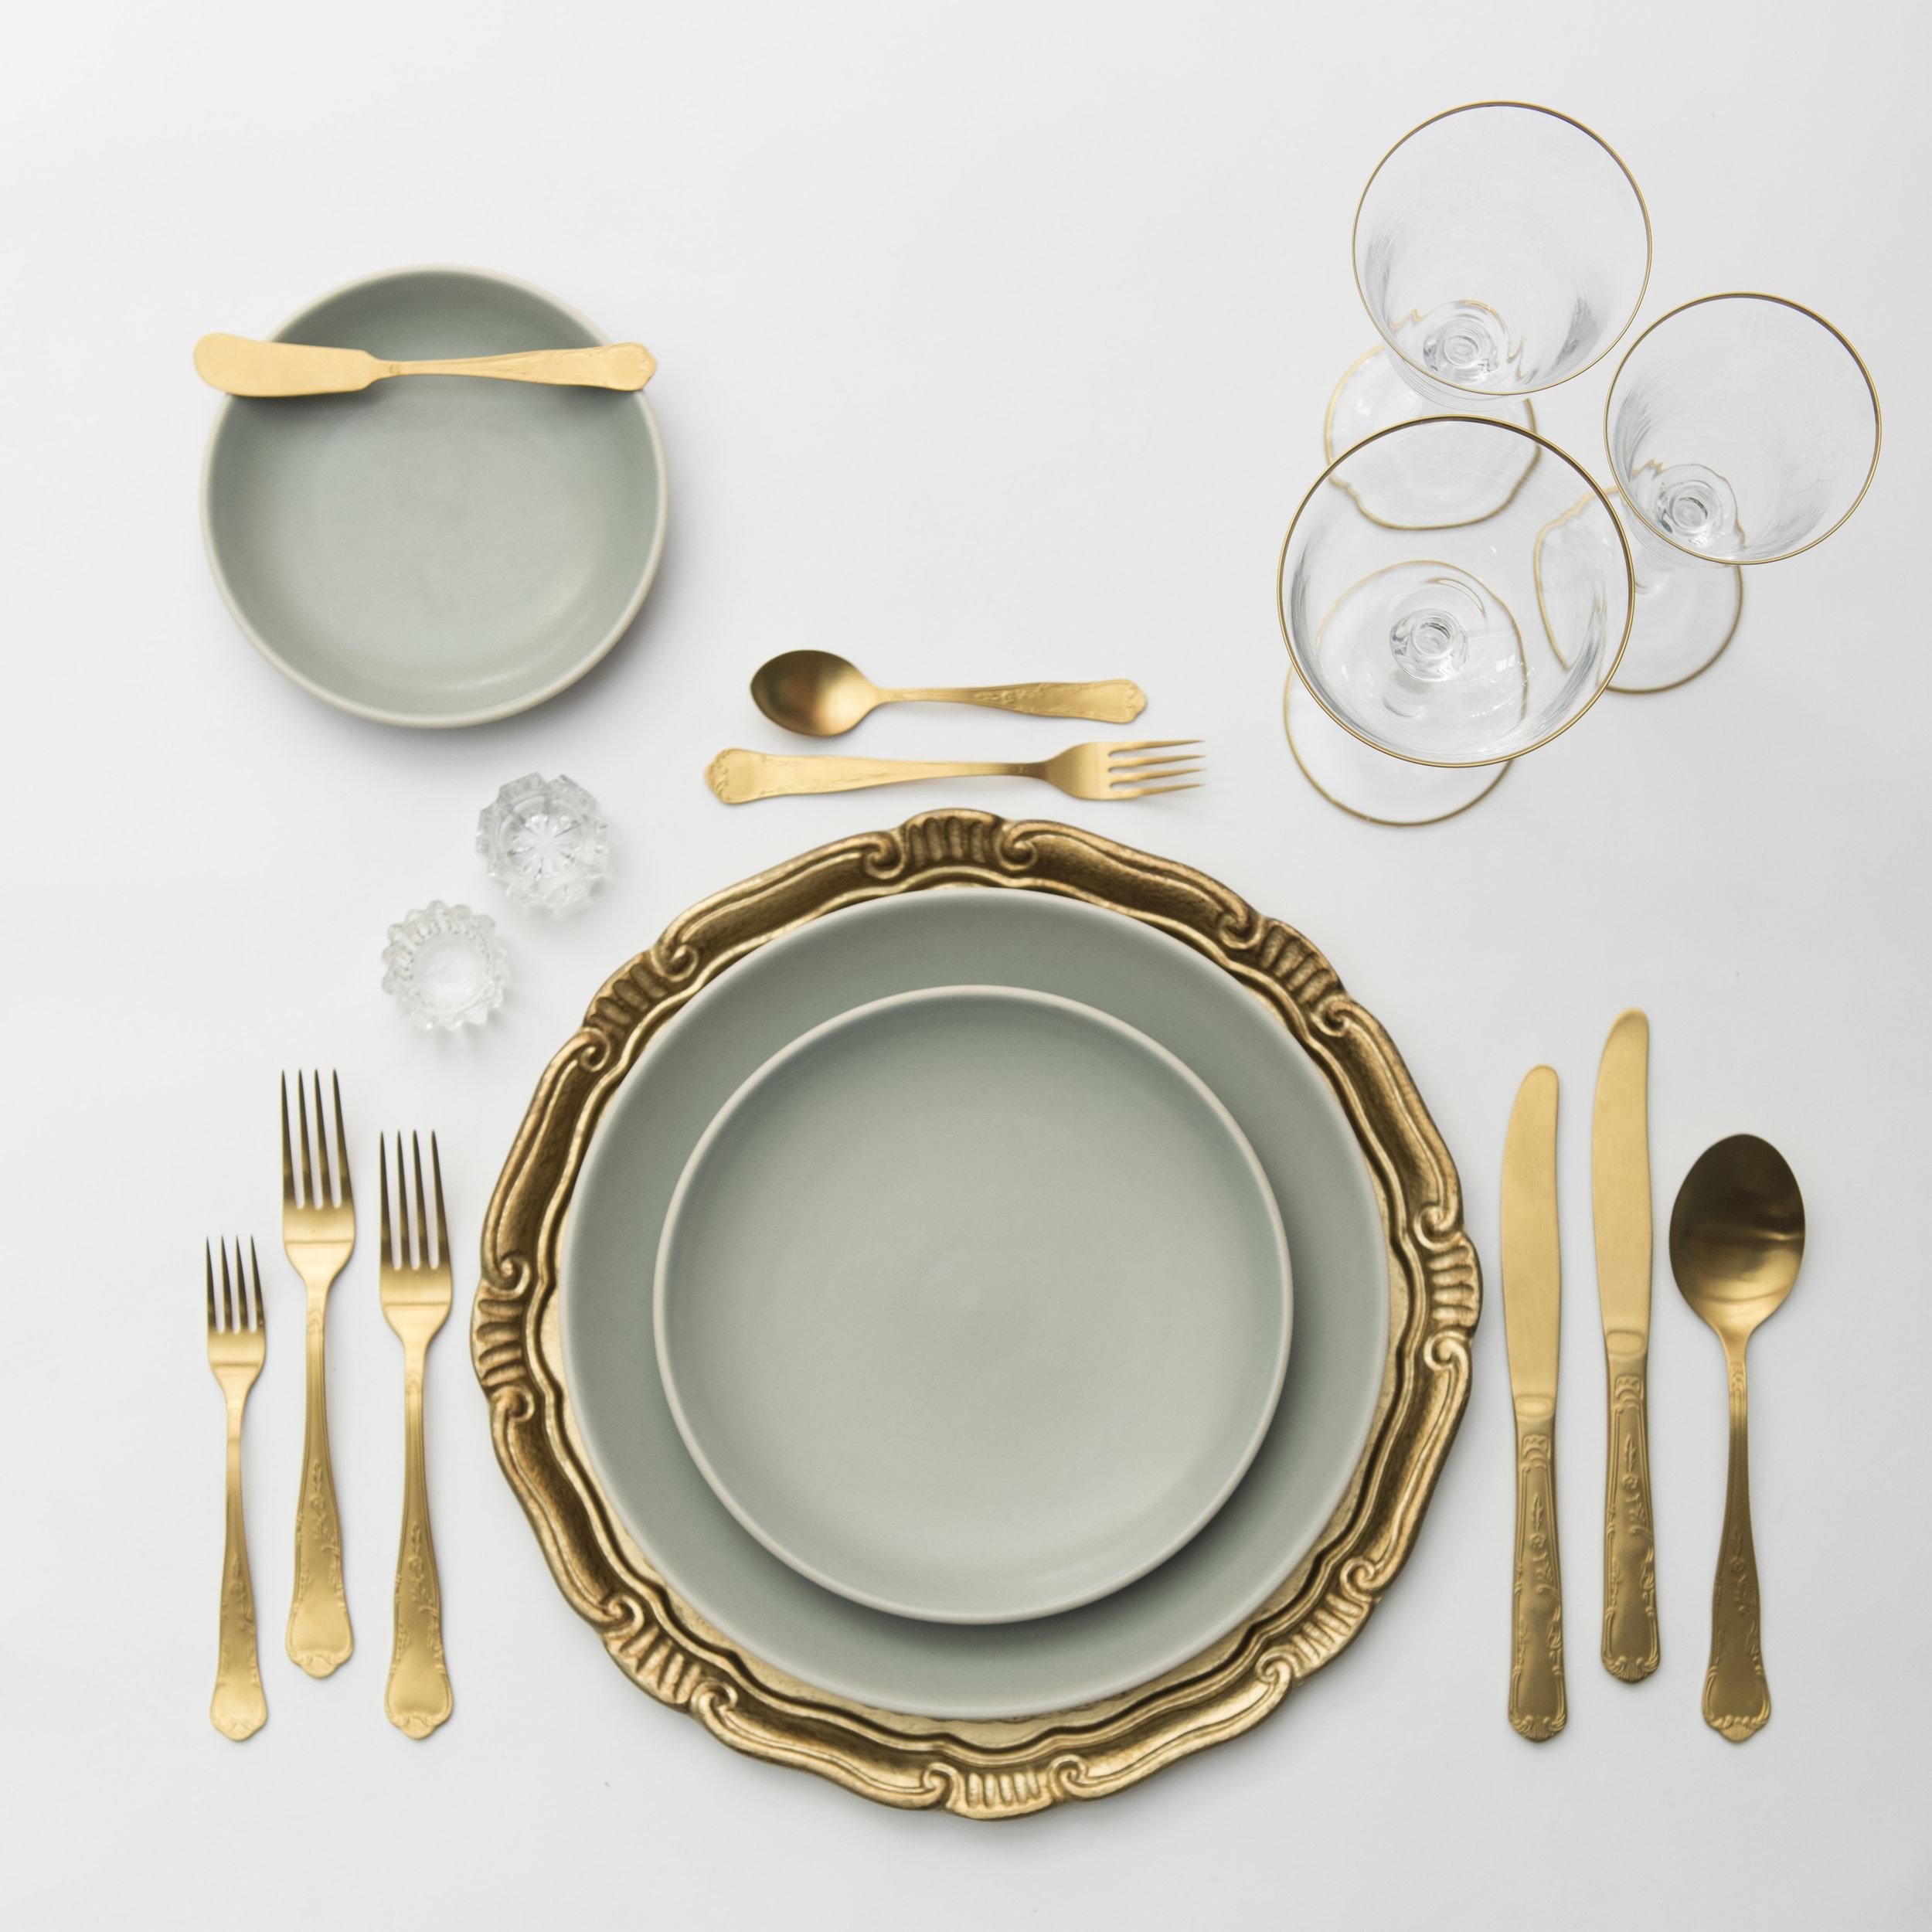 RENT: Florentine Charger in Gold + Heath Ceramics in Mist + Chateau Flatware in Matte Gold + Chloe 24k Gold Rimmed Stemware + Antique Crystal Salt Cellars  SHOP:Chloe 24k Gold Rimmed Stemware